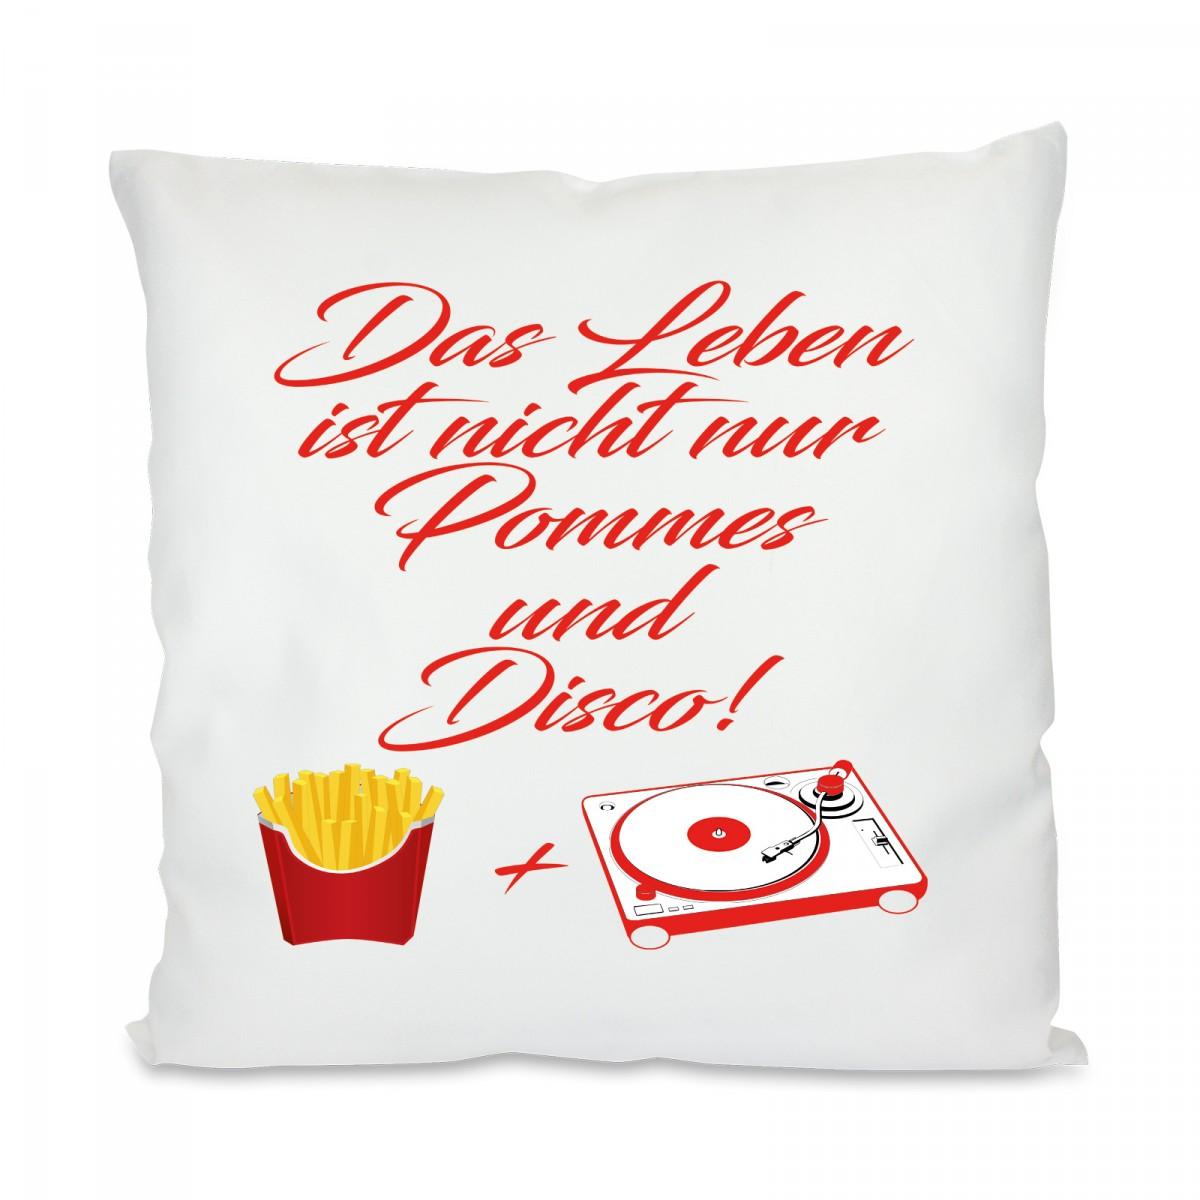 kissen mit motiv modell pommes und disco. Black Bedroom Furniture Sets. Home Design Ideas